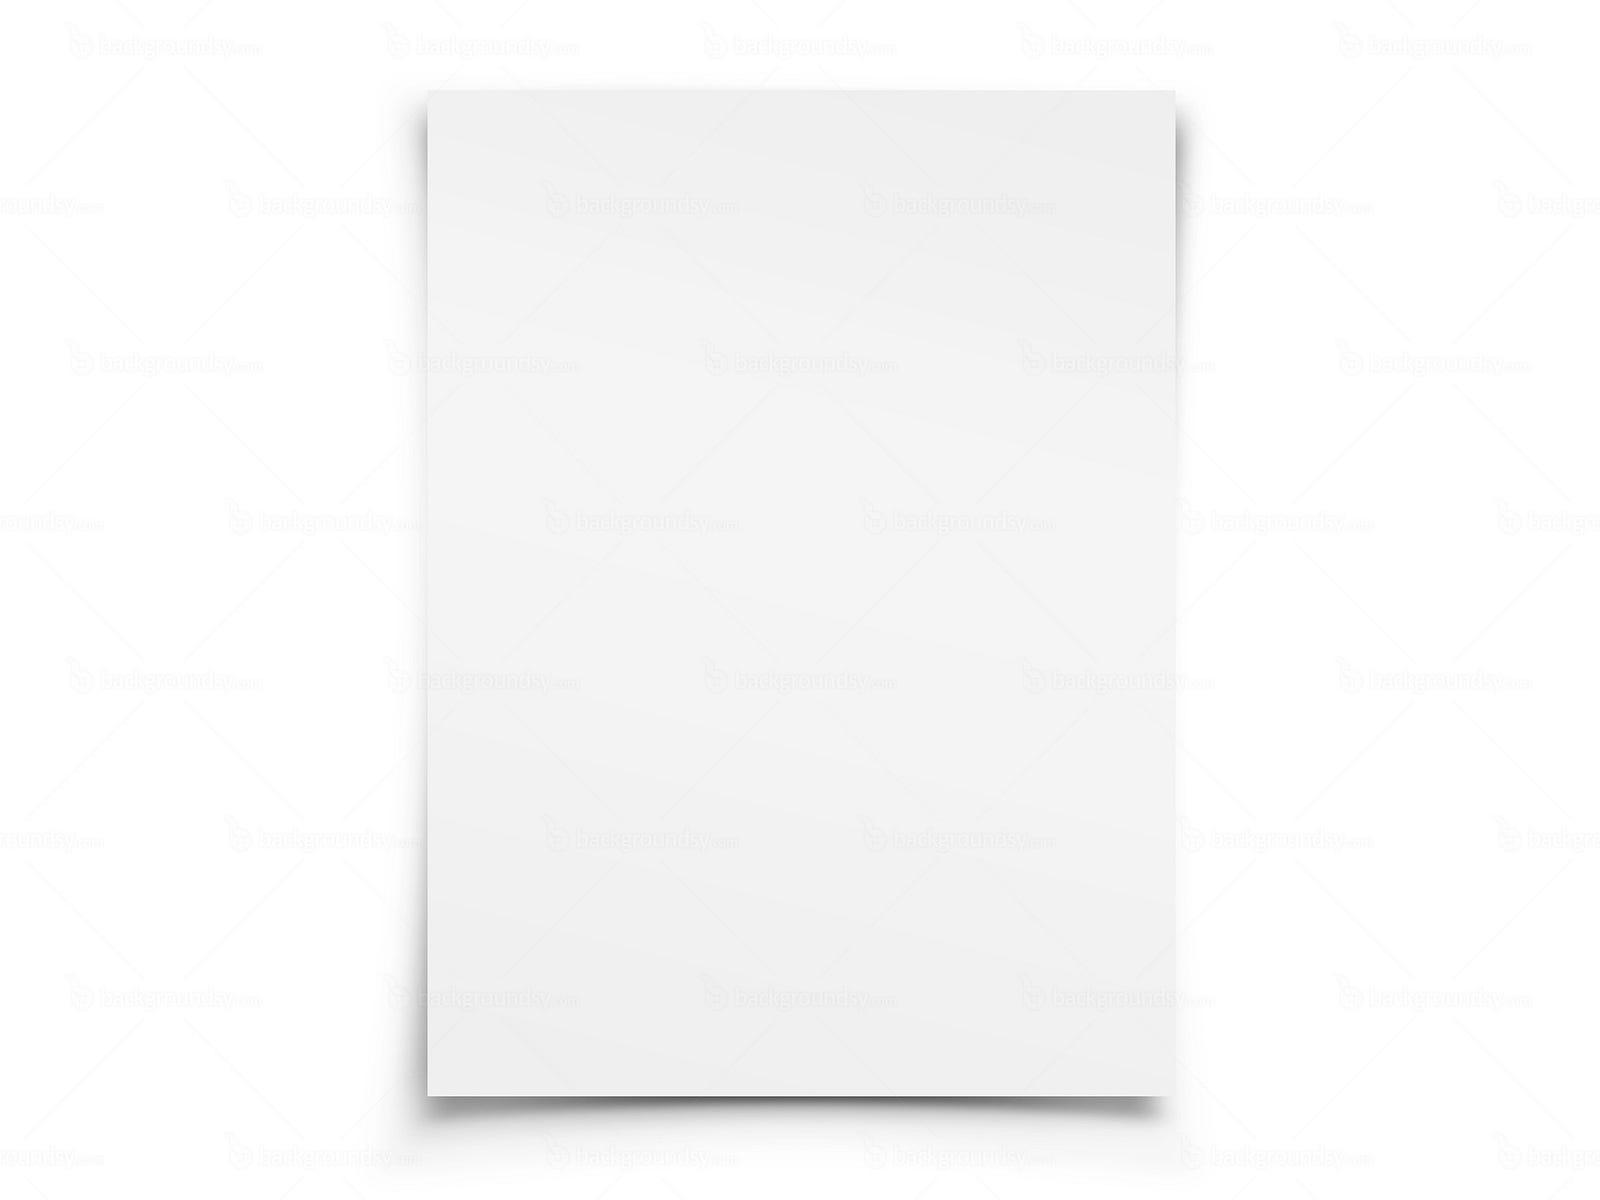 That Blank Sheet Of Paper Pf Dumanis Medium